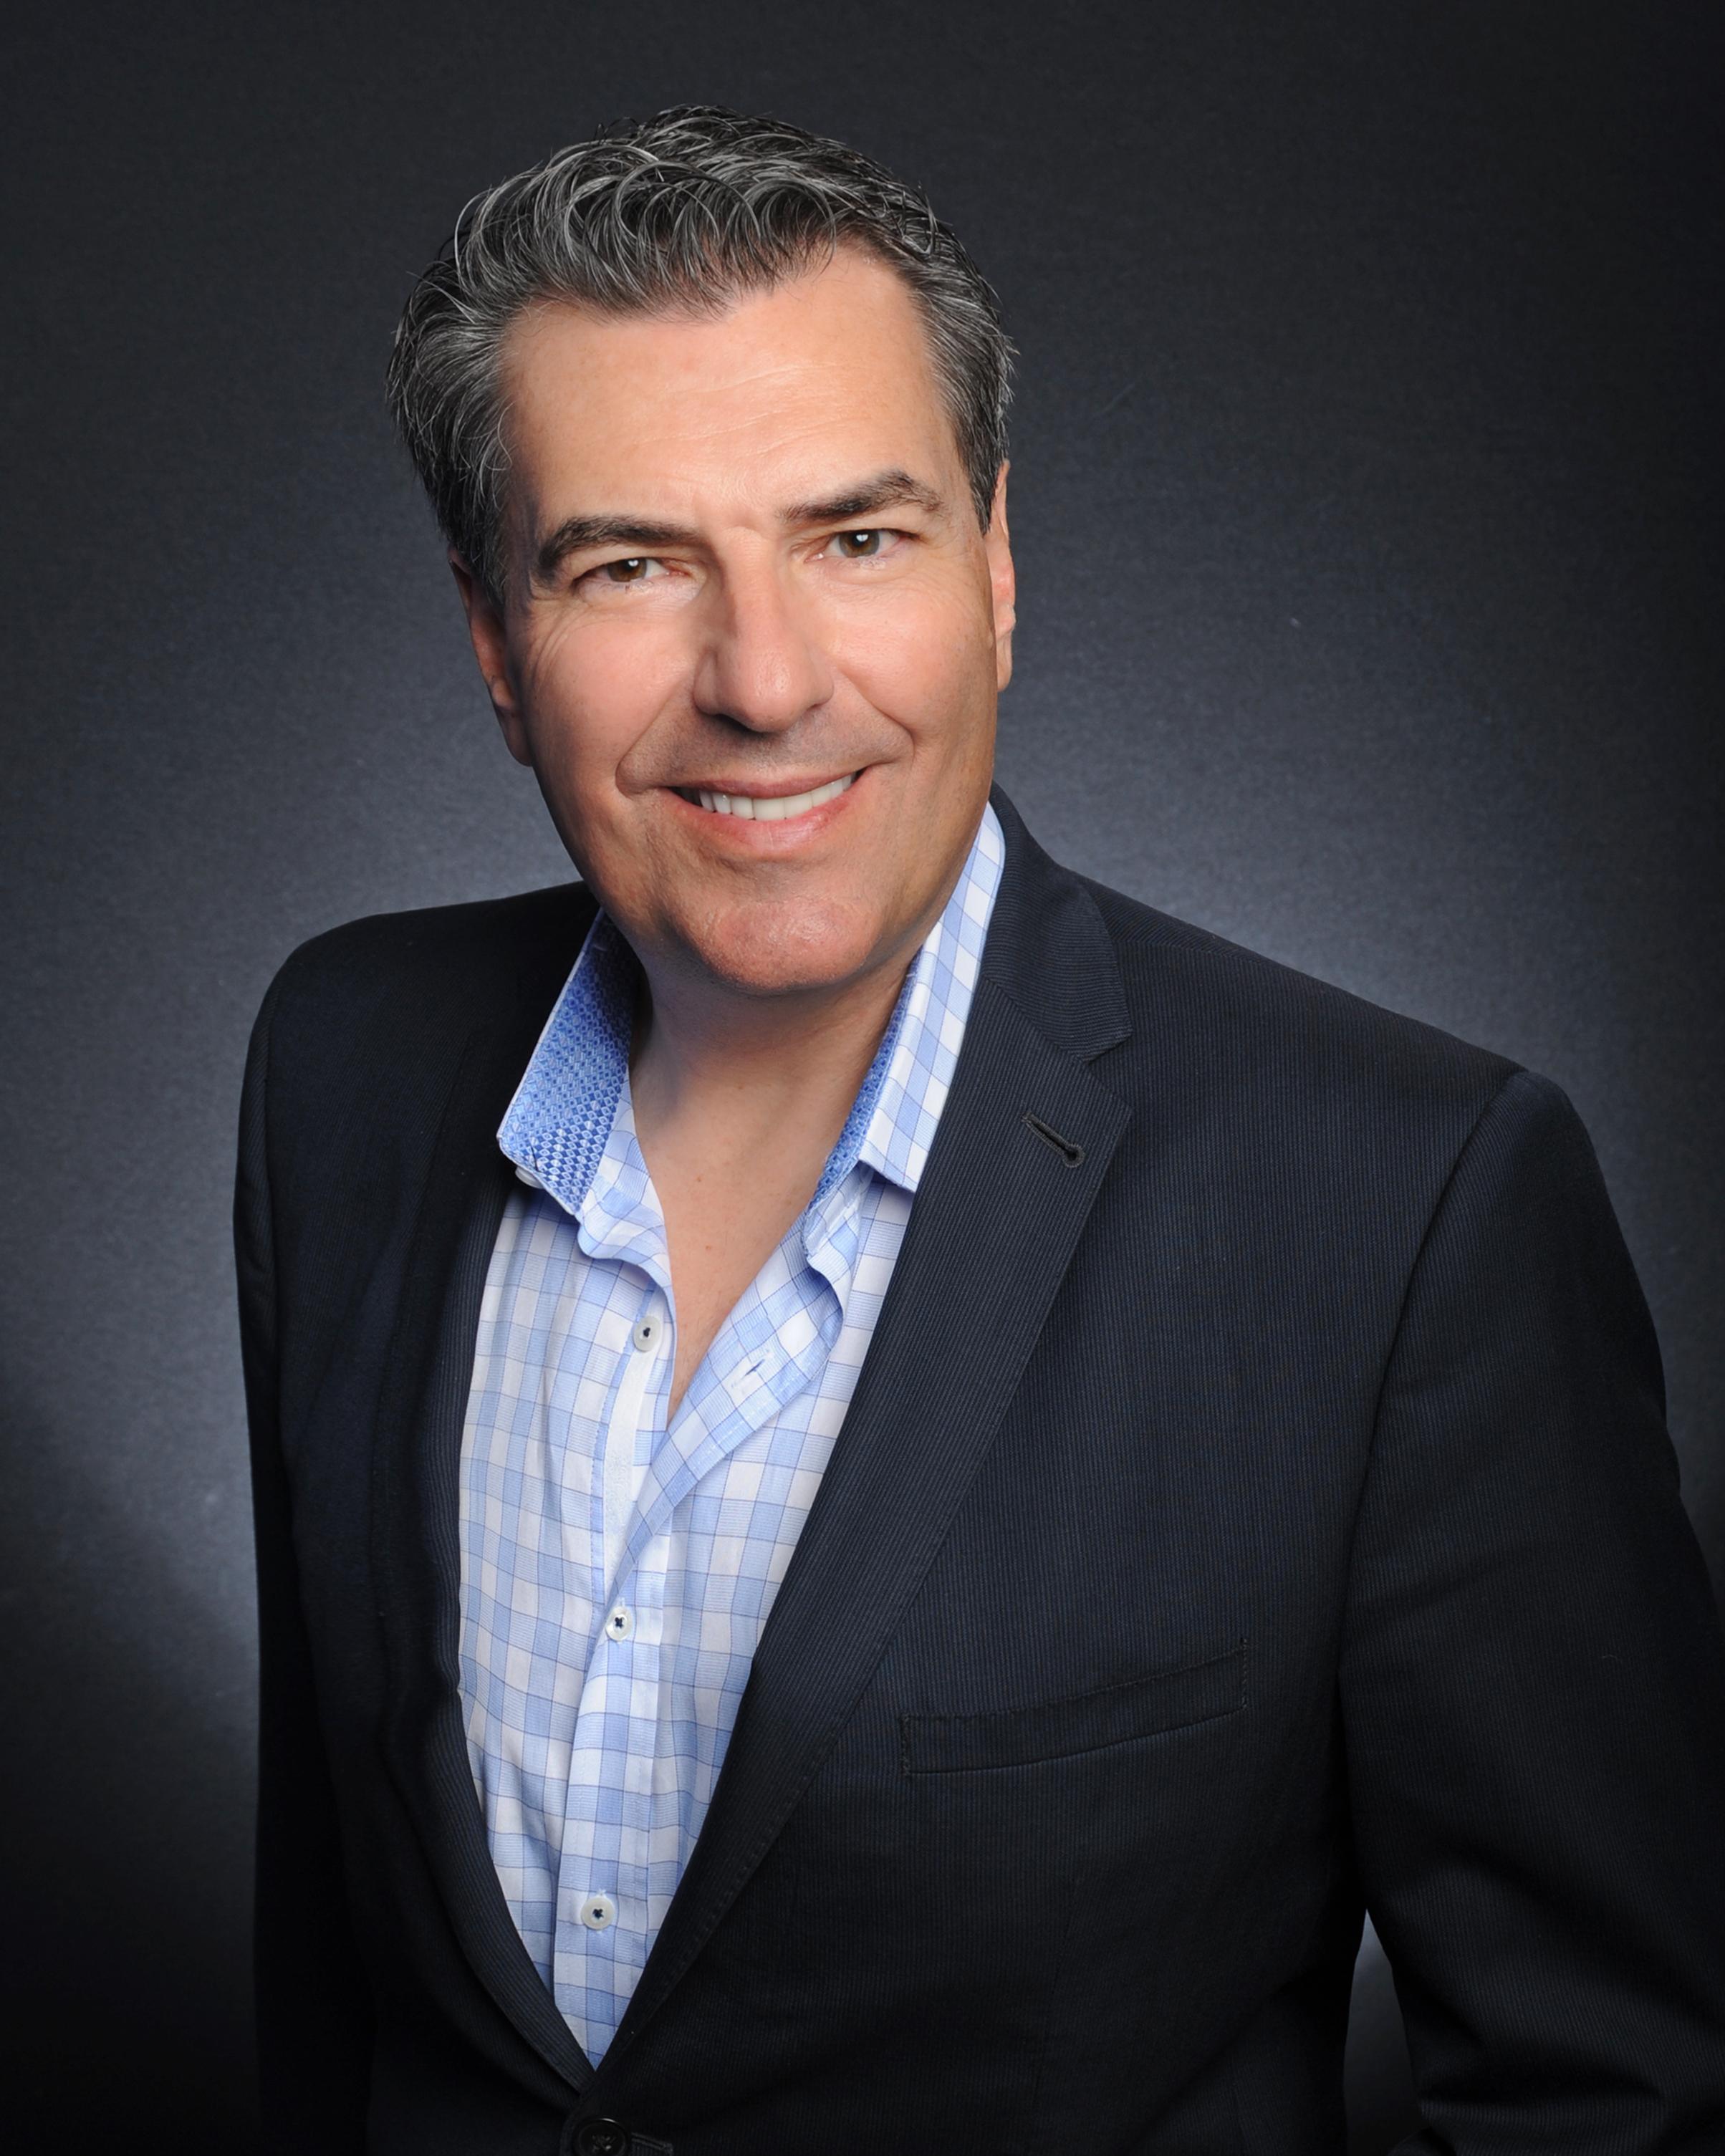 Tony Barberi